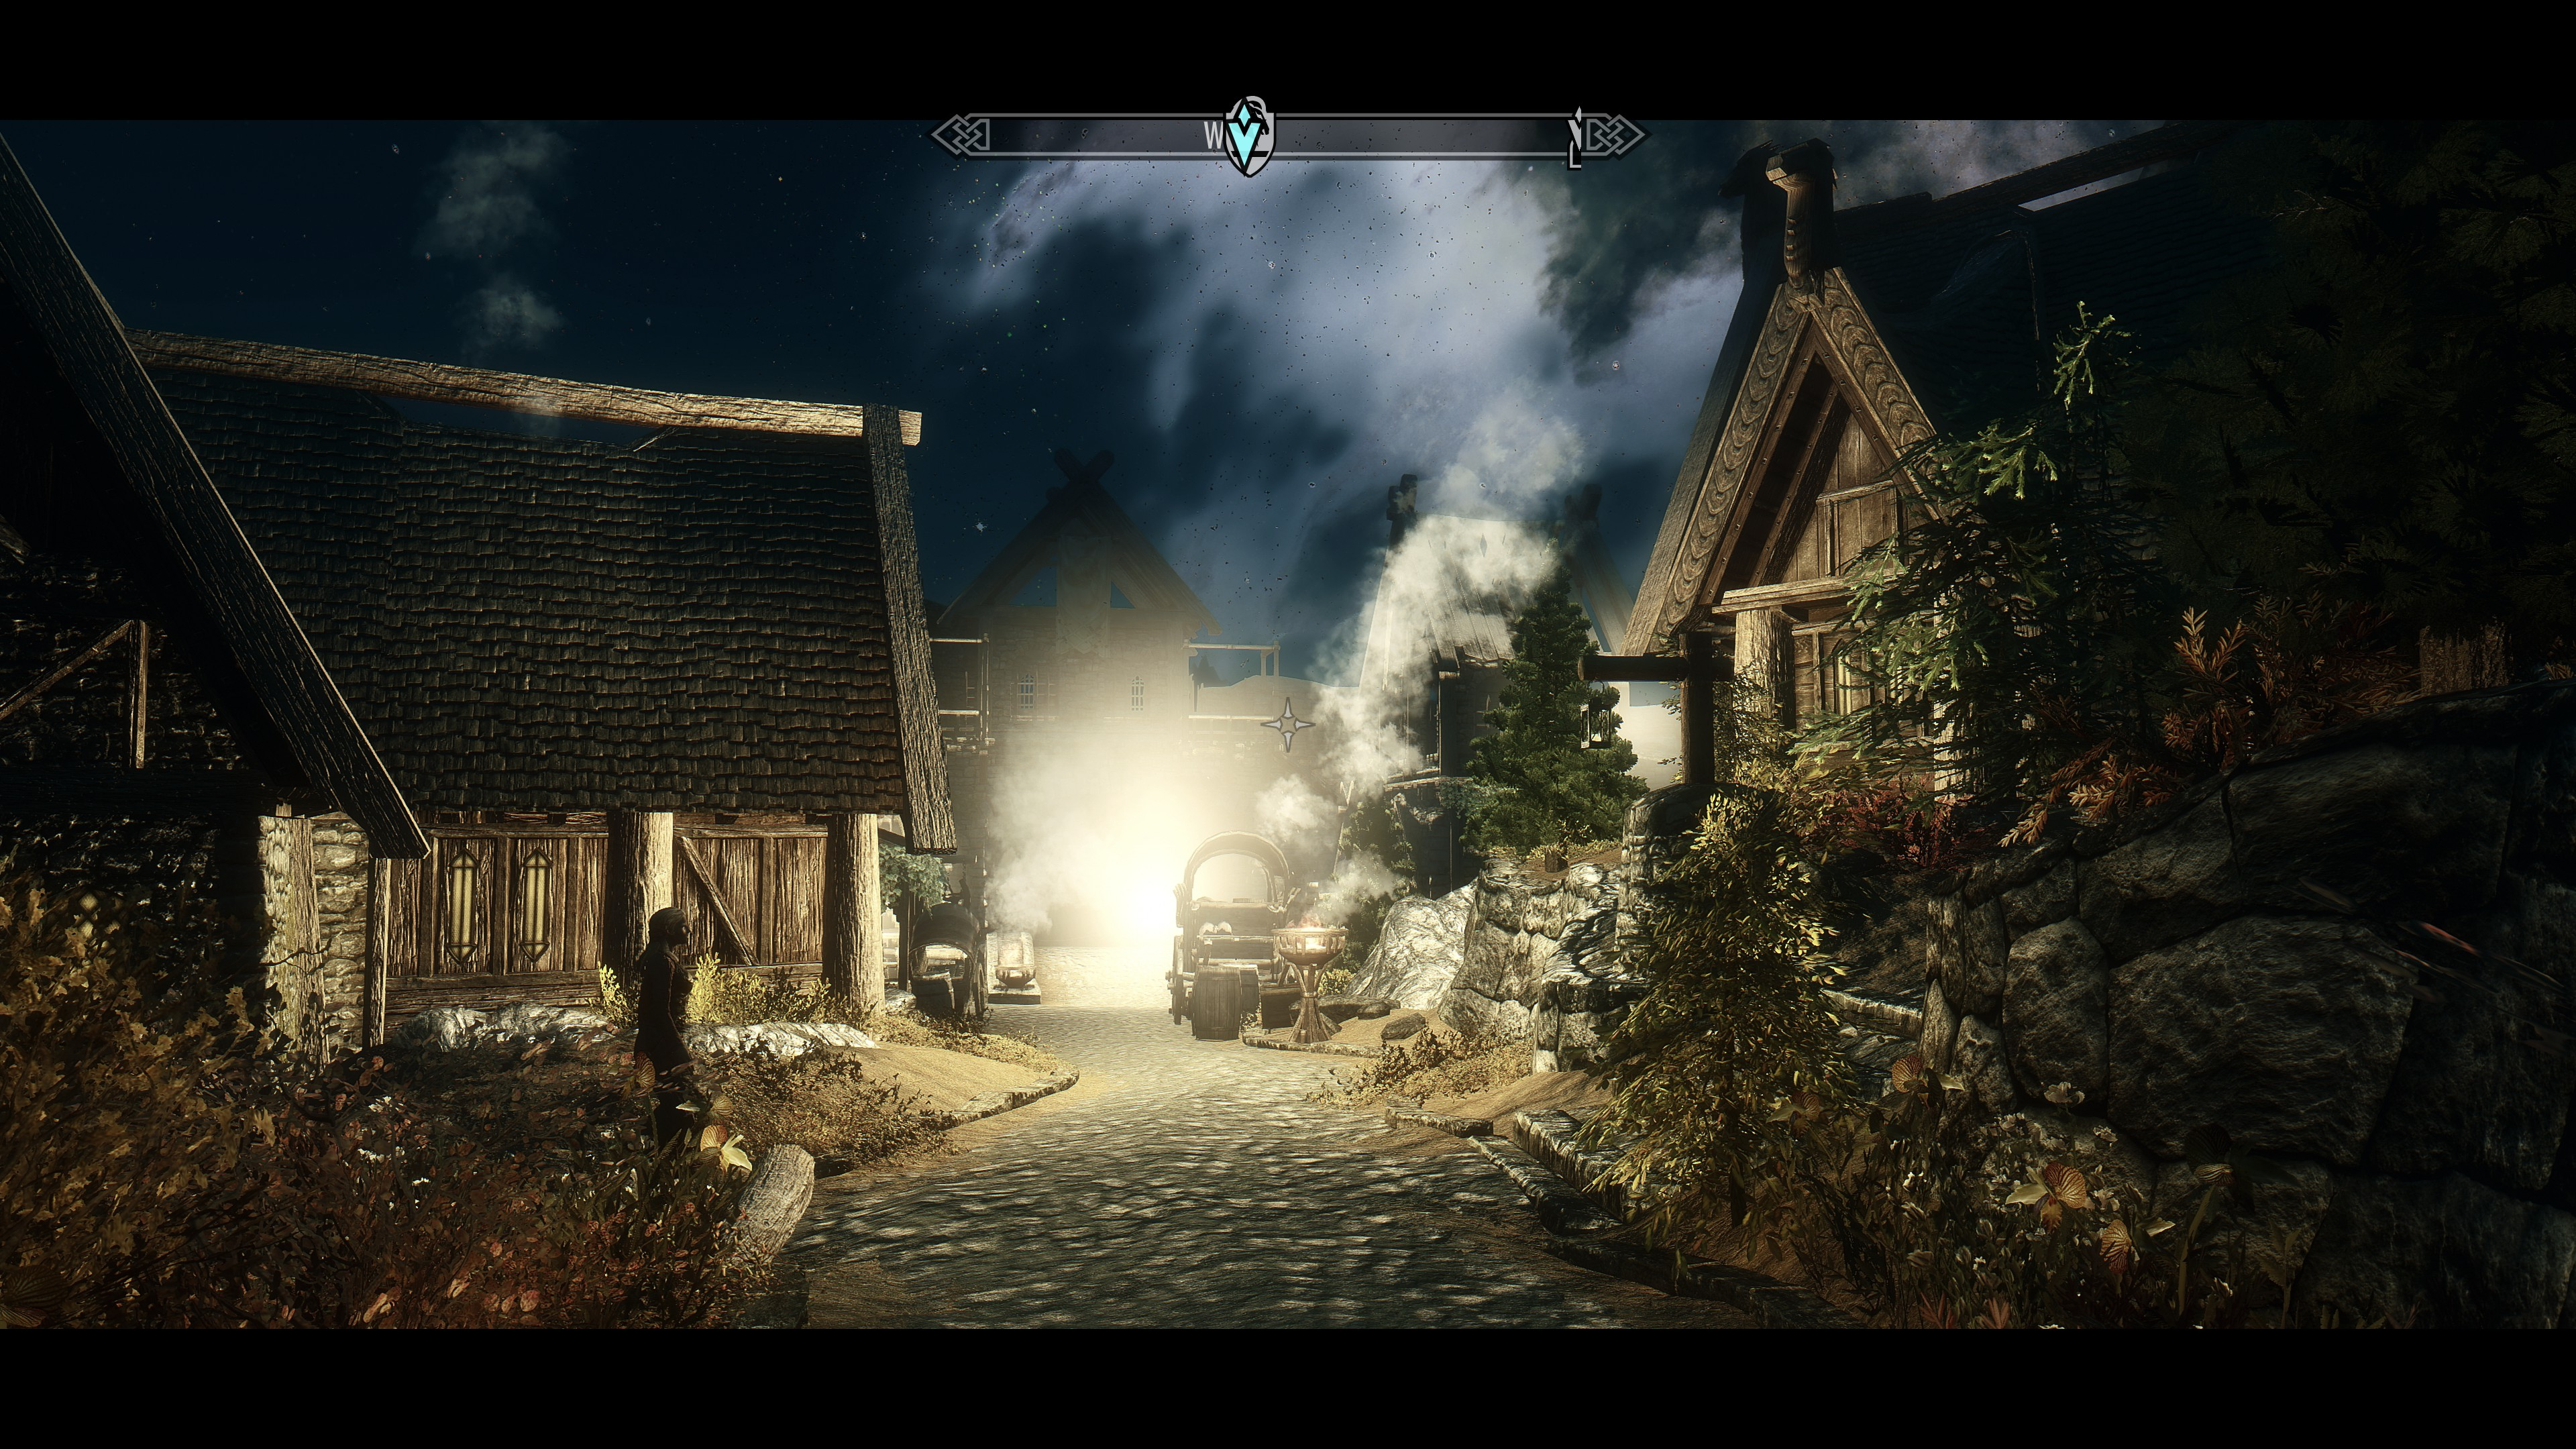 20191207032029_1.jpg - The Elder Scrolls 5: Skyrim